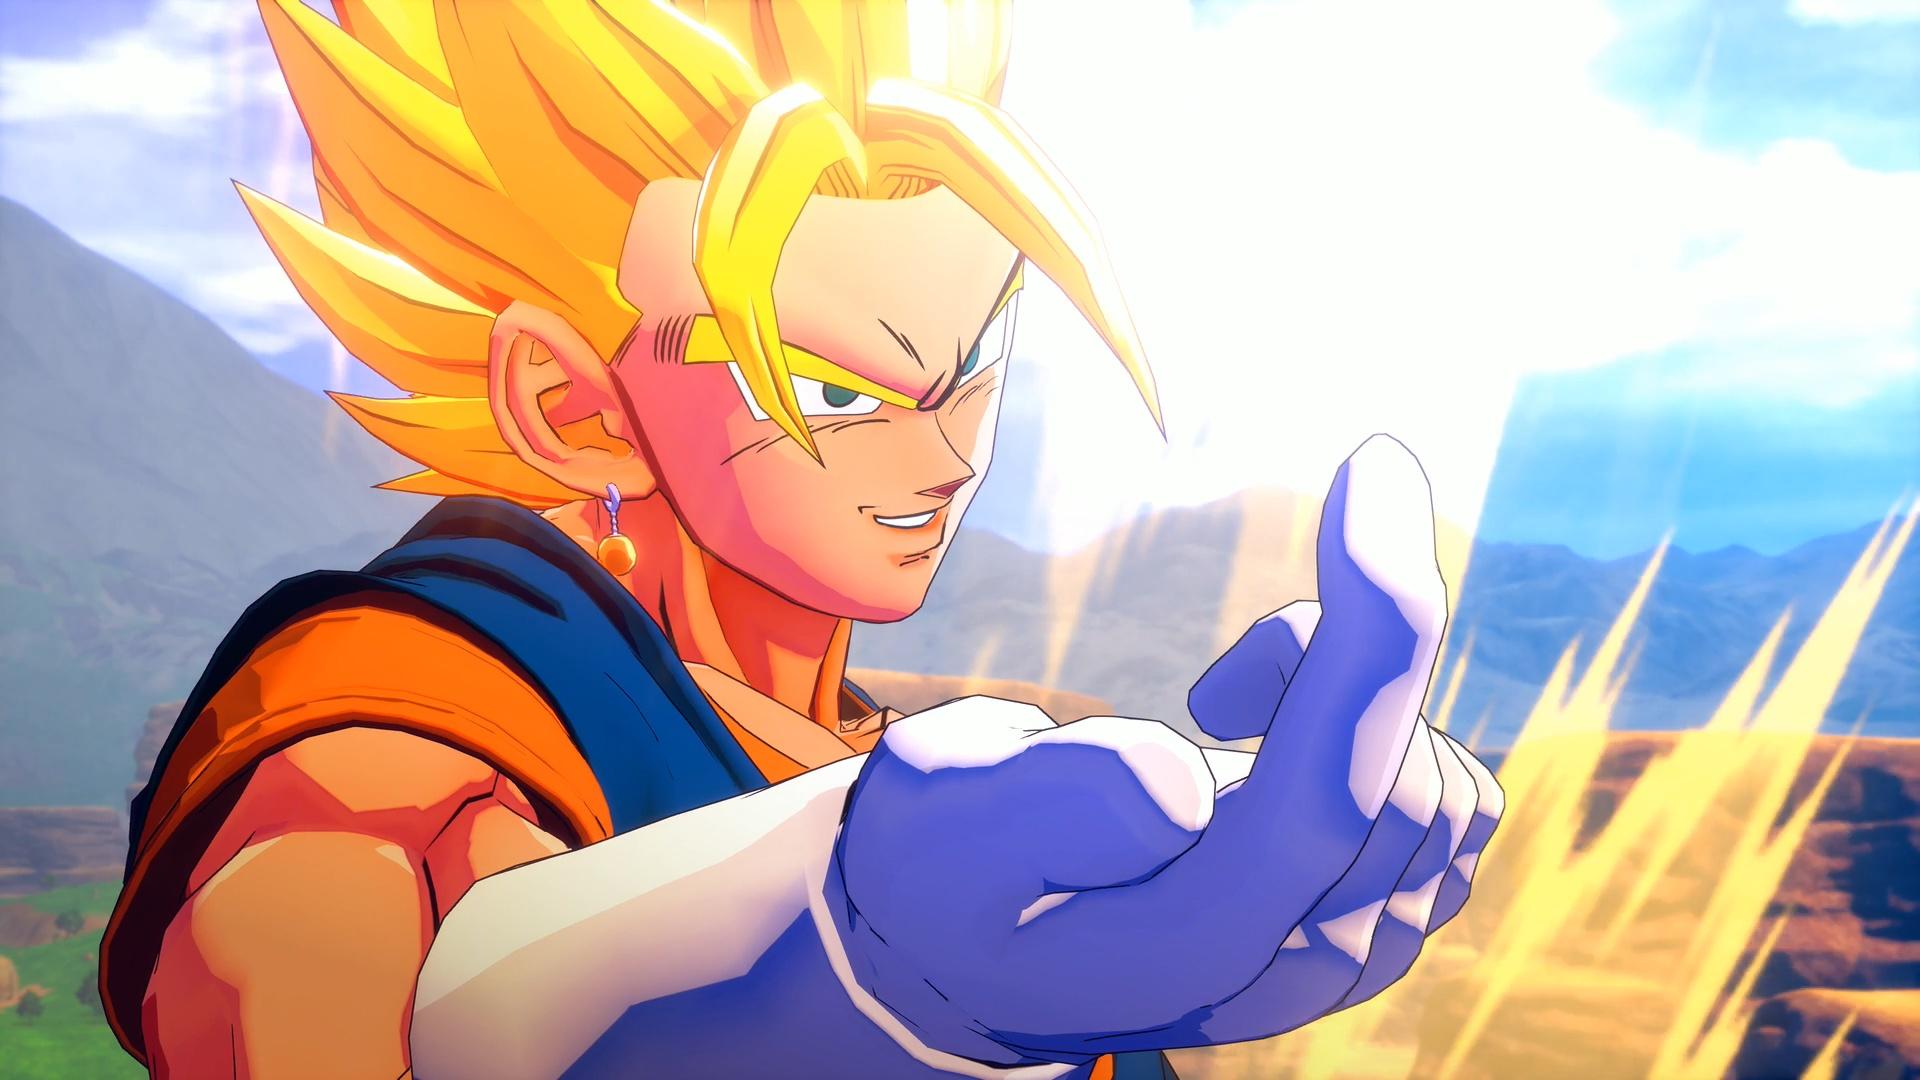 Dragon Ball Z Kakarot: DLC enthüllt bisher unbekanntes Saiyajin-Detail